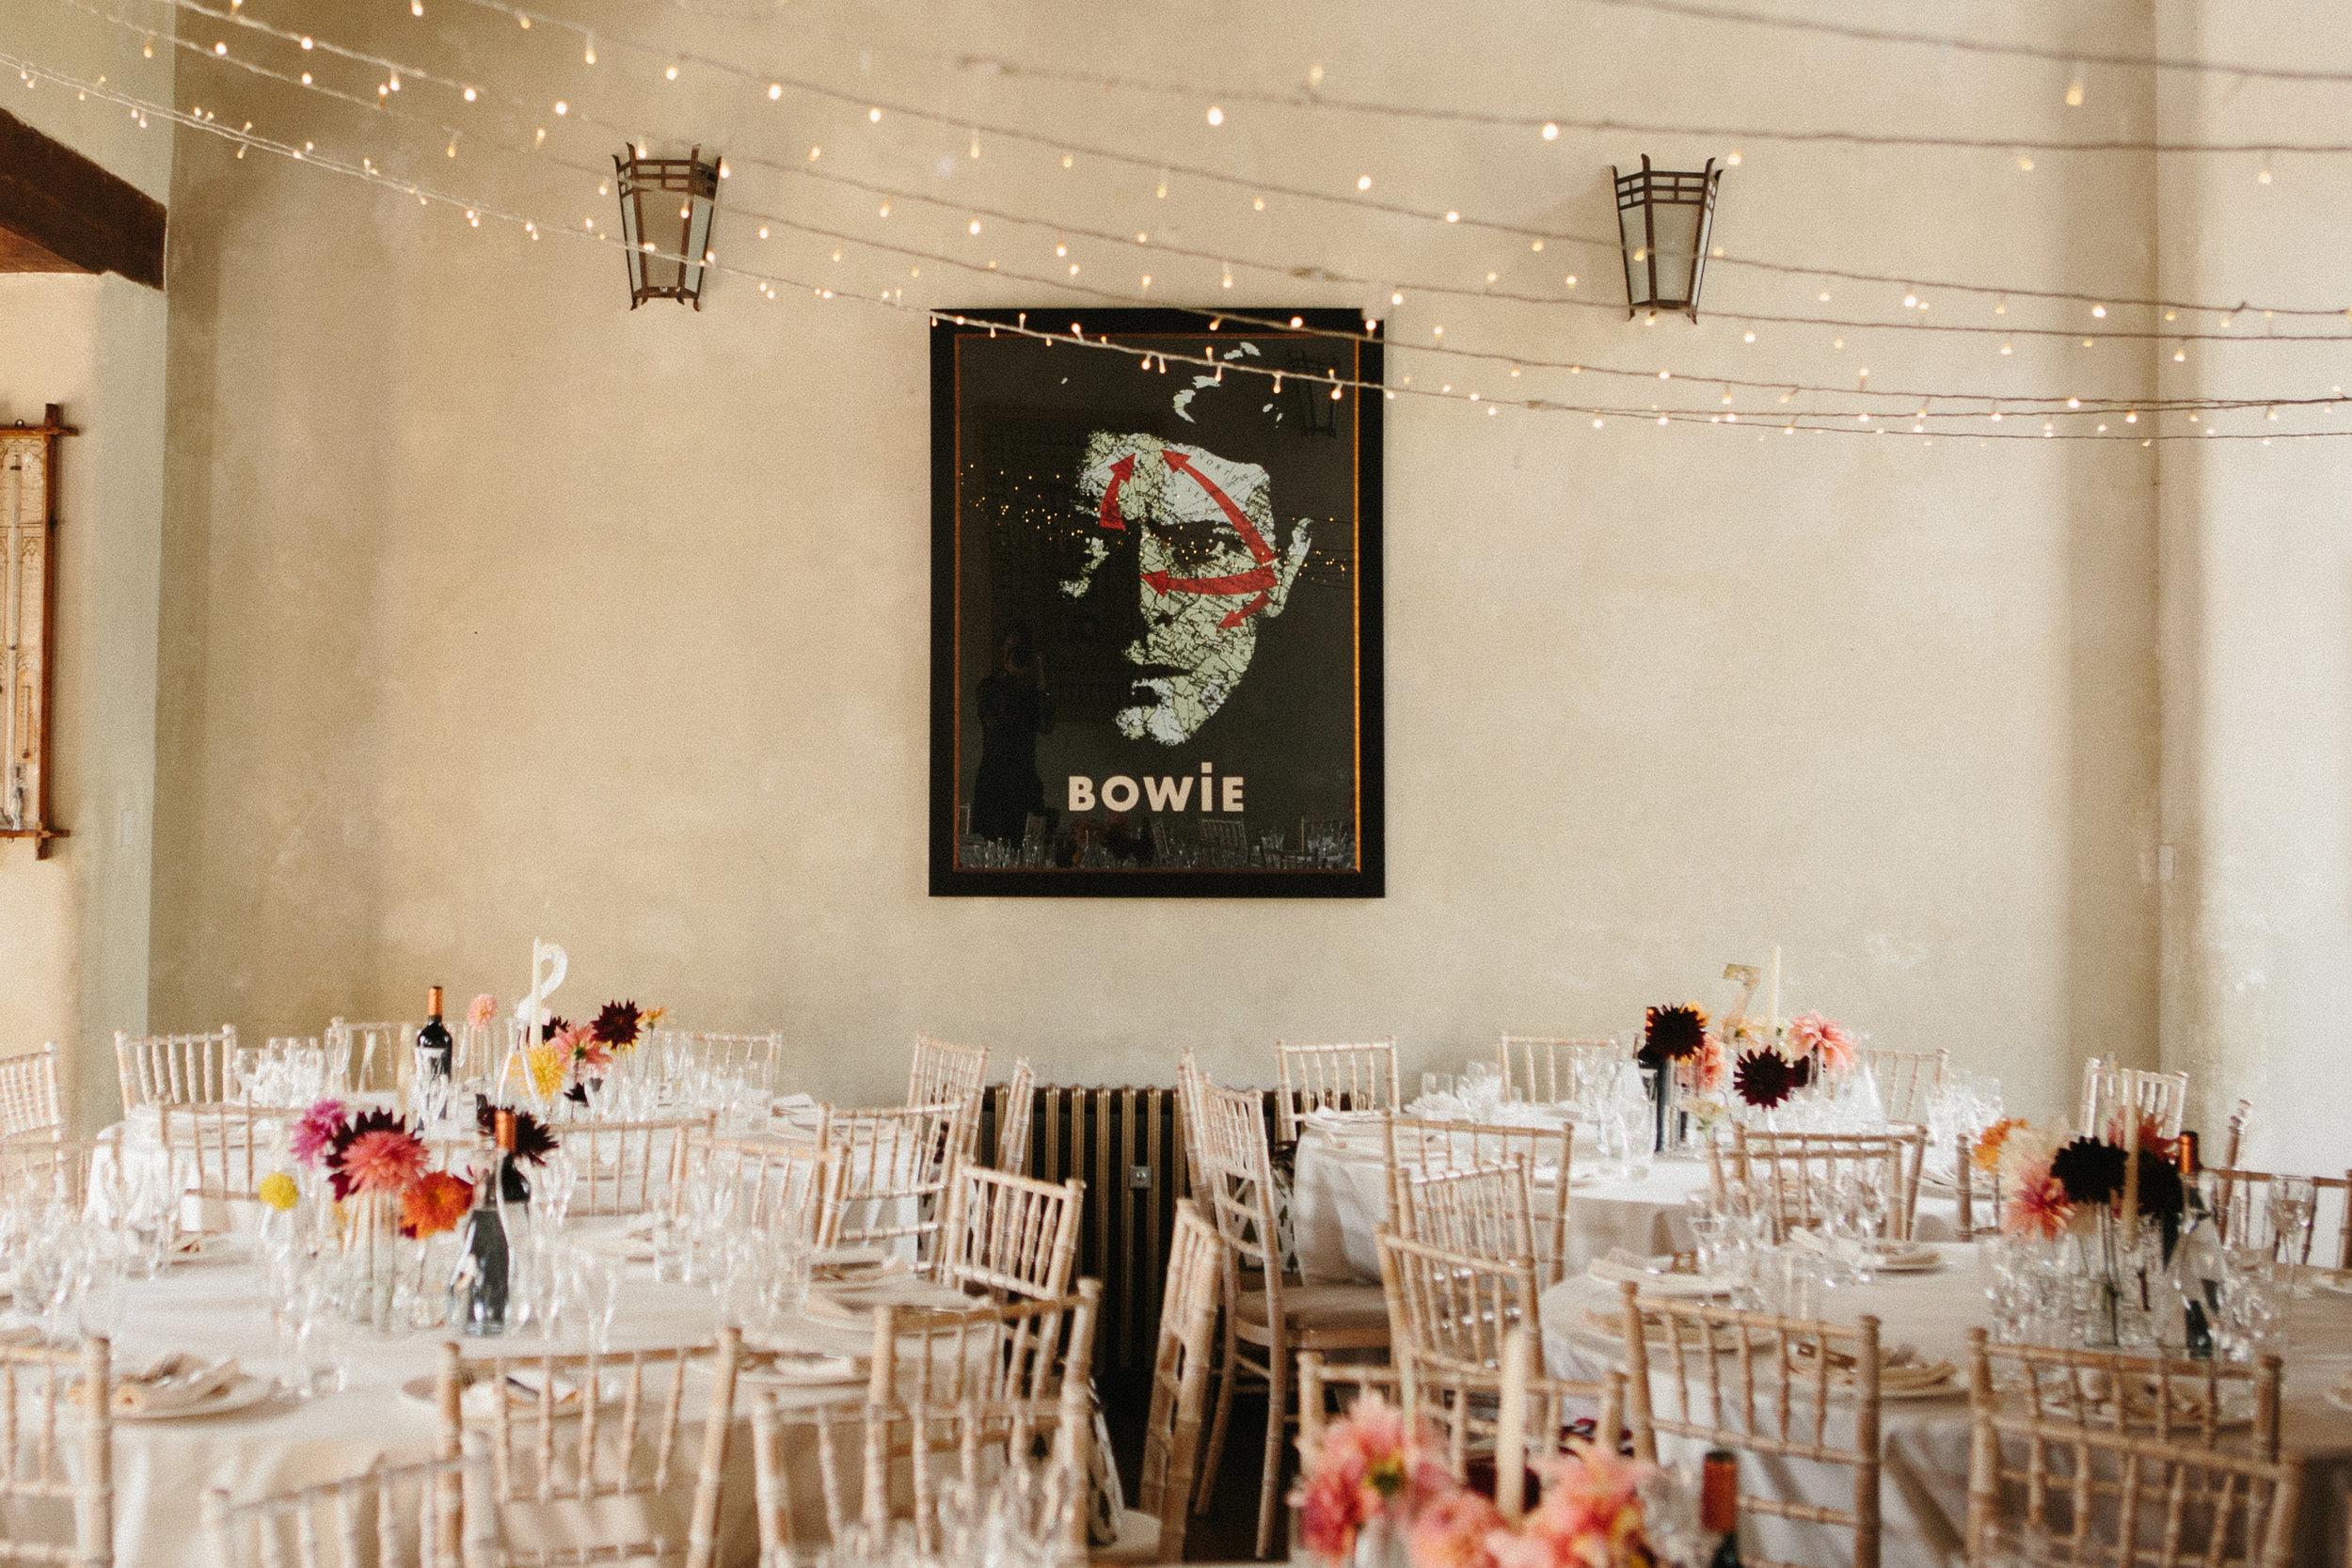 Kate-Beaumont-Sheffield-Honeysuckle-bias-cut-wedding-dress-oyster-Rosie22.jpg